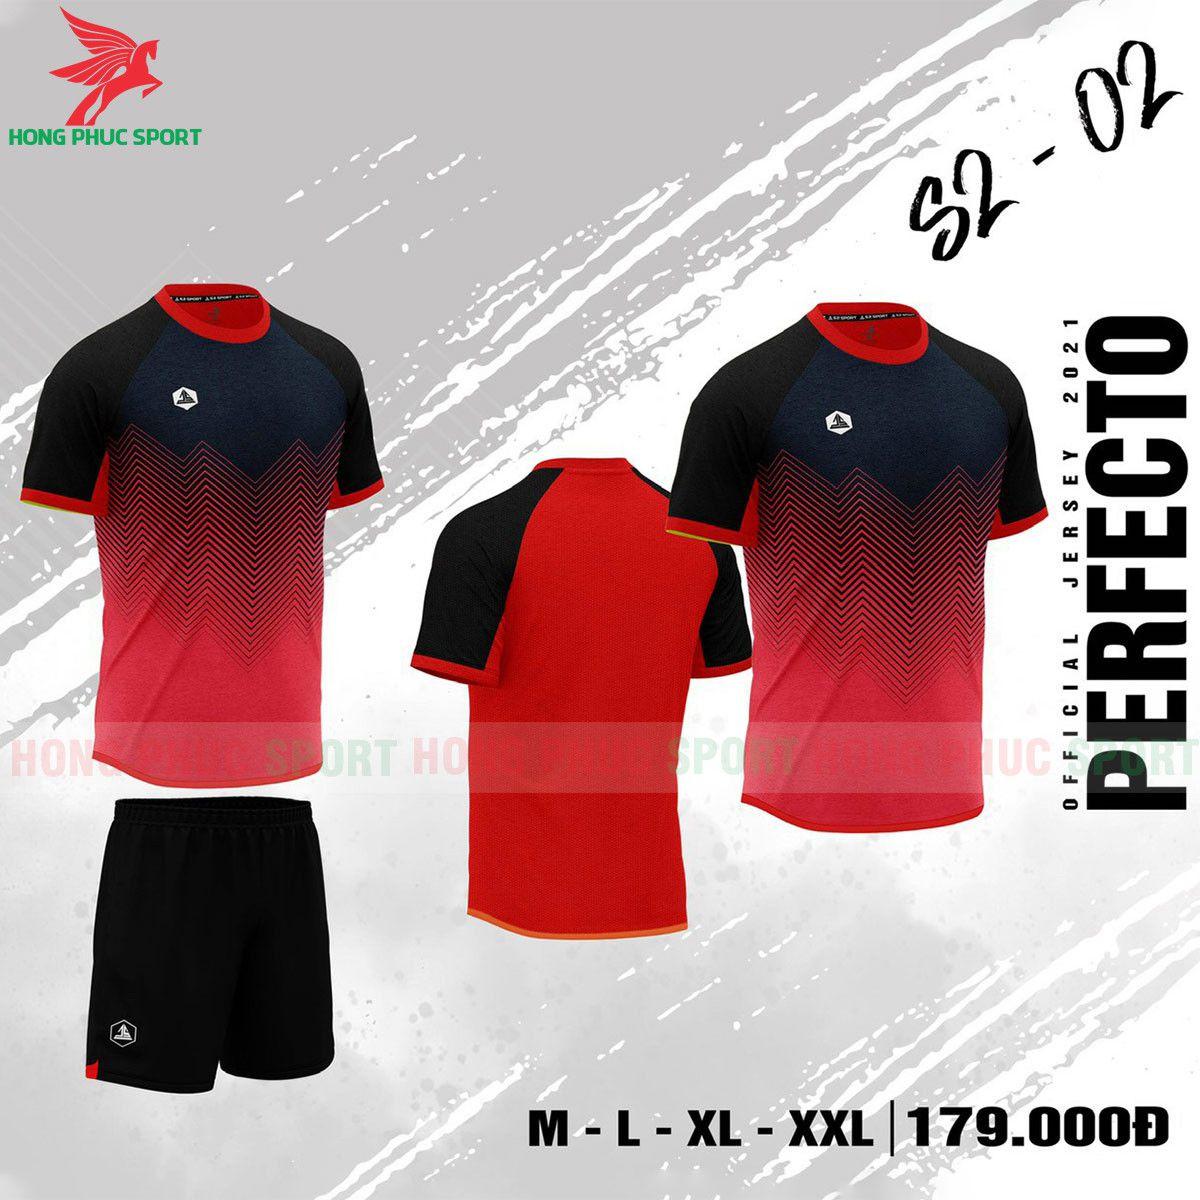 https://cdn.hongphucsport.com/unsafe/s4.shopbay.vn/files/285/ao-bong-da-khong-logo-authentic-2021-perfecto-do-60f53c8c5afac.jpg